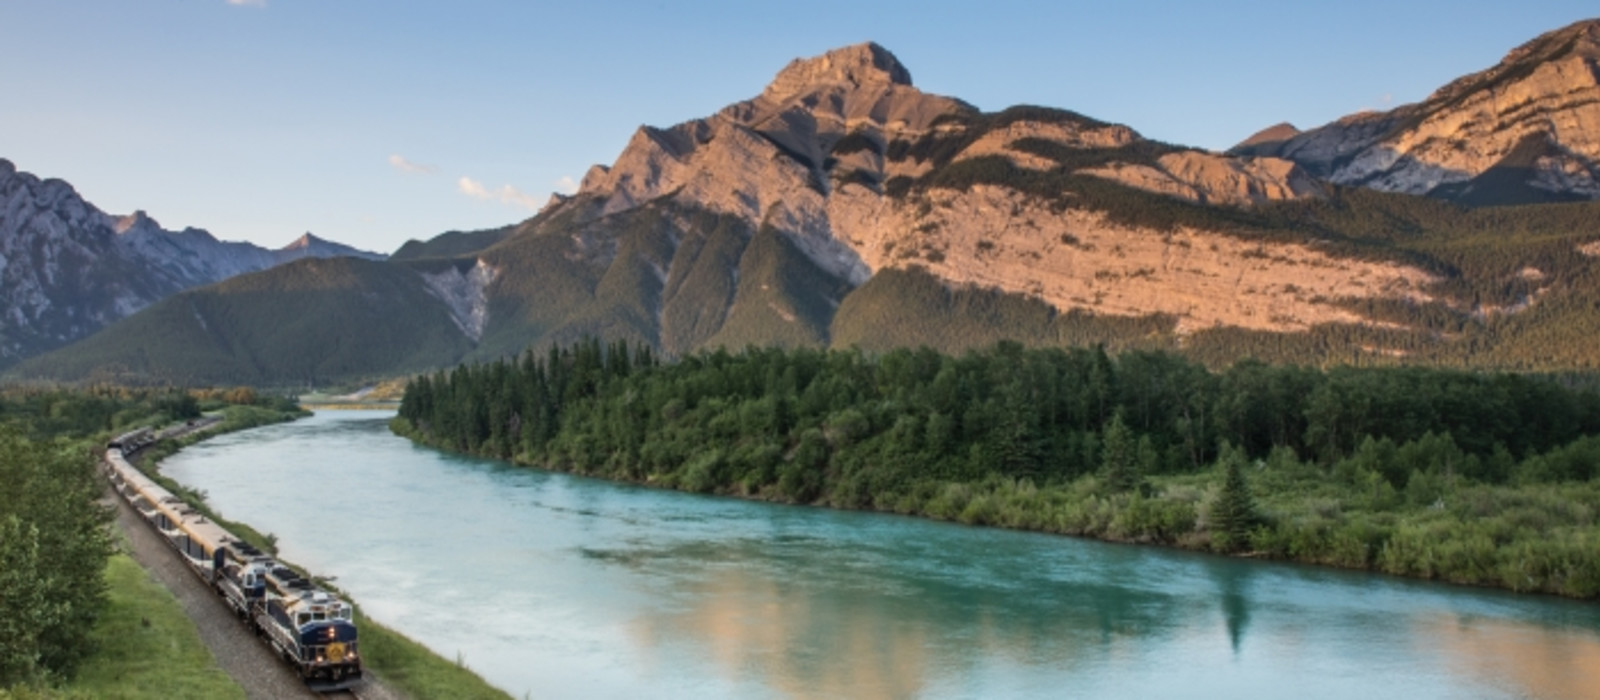 Hotel Rocky Mountaineer Whistler Canada